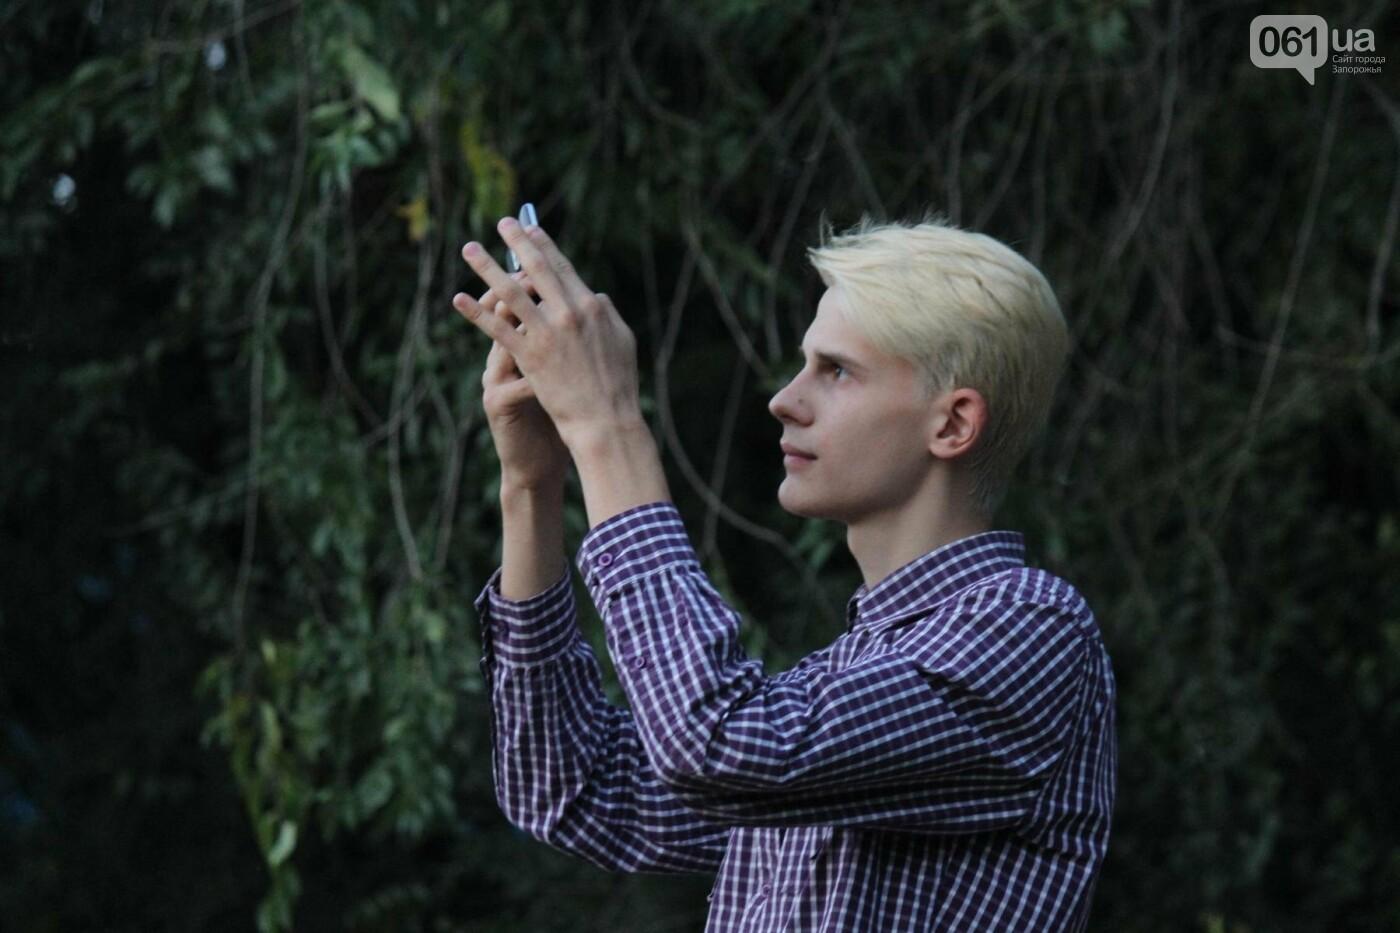 Найди себя: 50 портретов посетителей фестиваля Khortytsia Freedom, – ФОТОРЕПОРТАЖ, фото-39